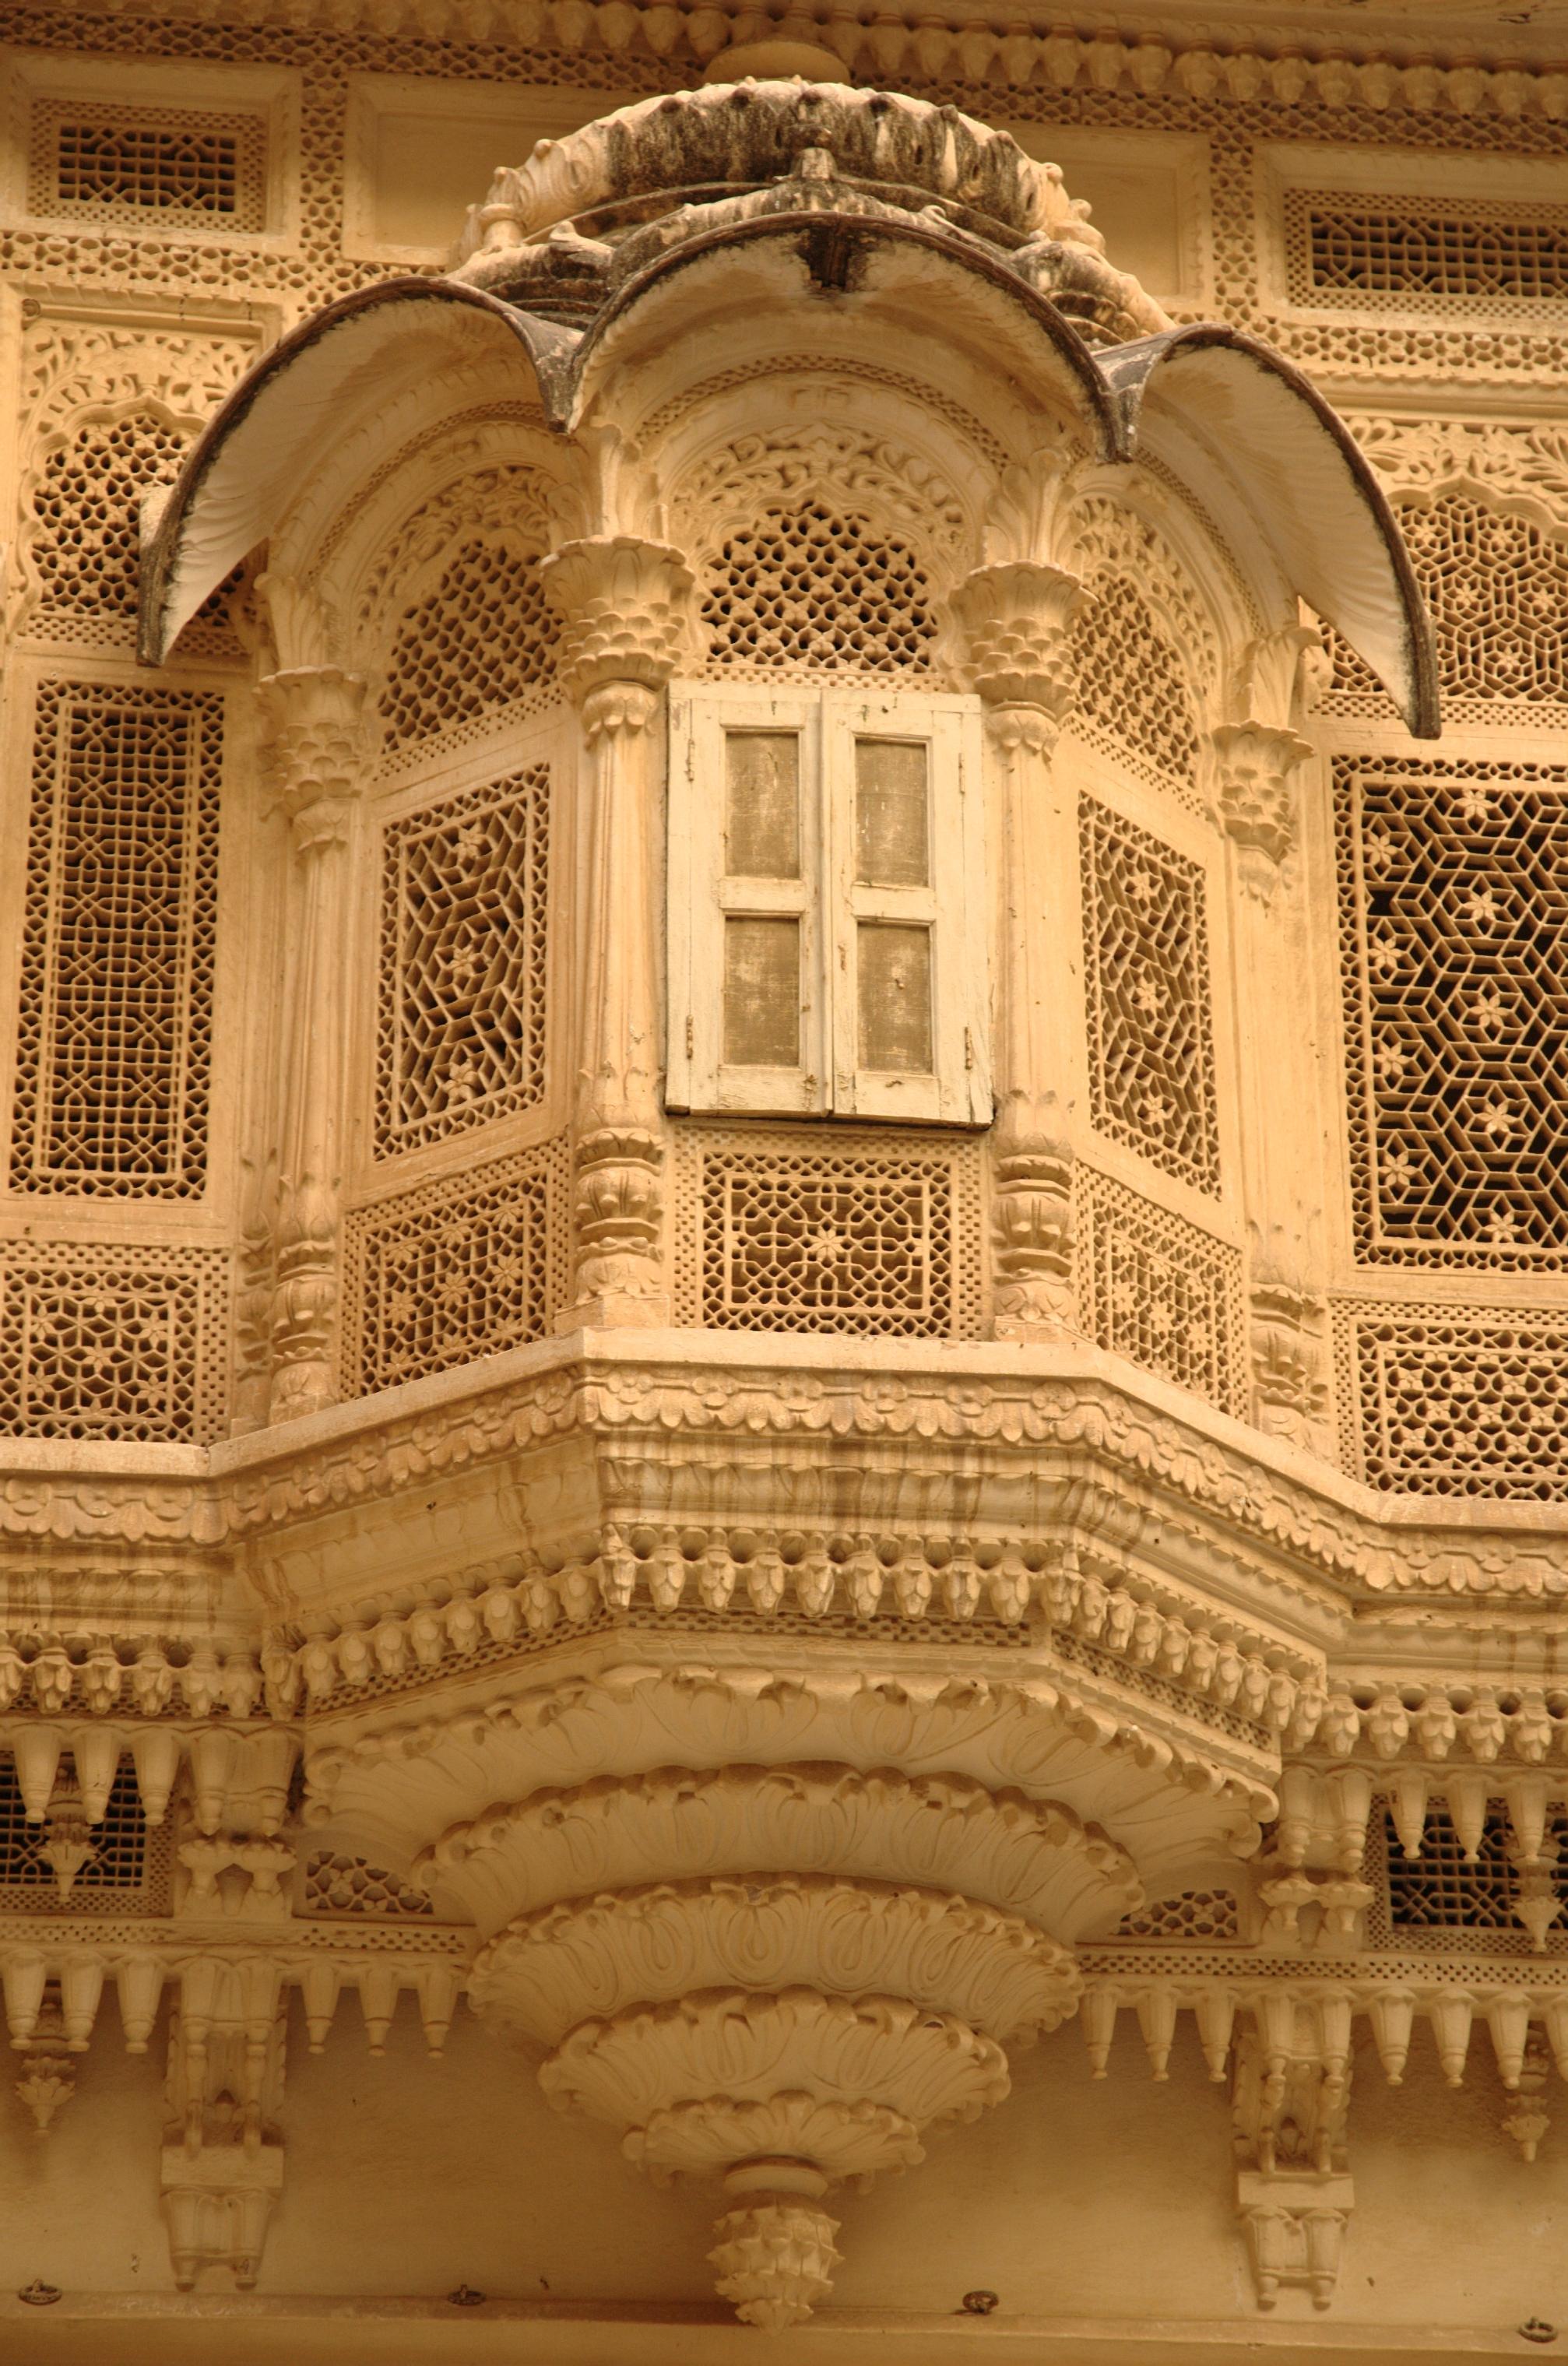 FileCarved balcony Mehrangarh Fortjpg  Wikimedia Commons